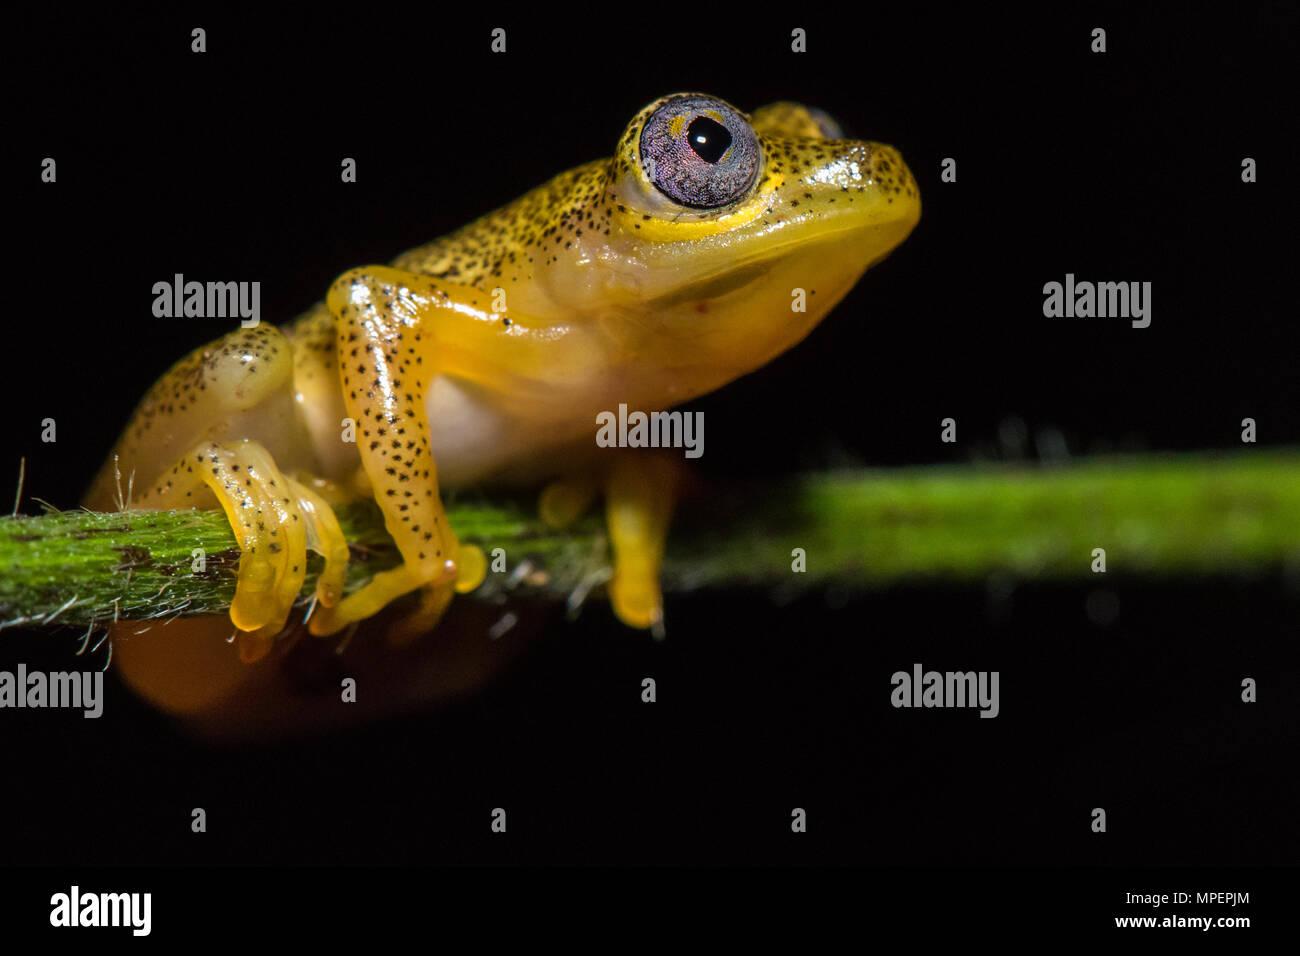 Reedfrog species (Heterixalus punctatus), Andasibe National Park, Madagascar - Stock Image